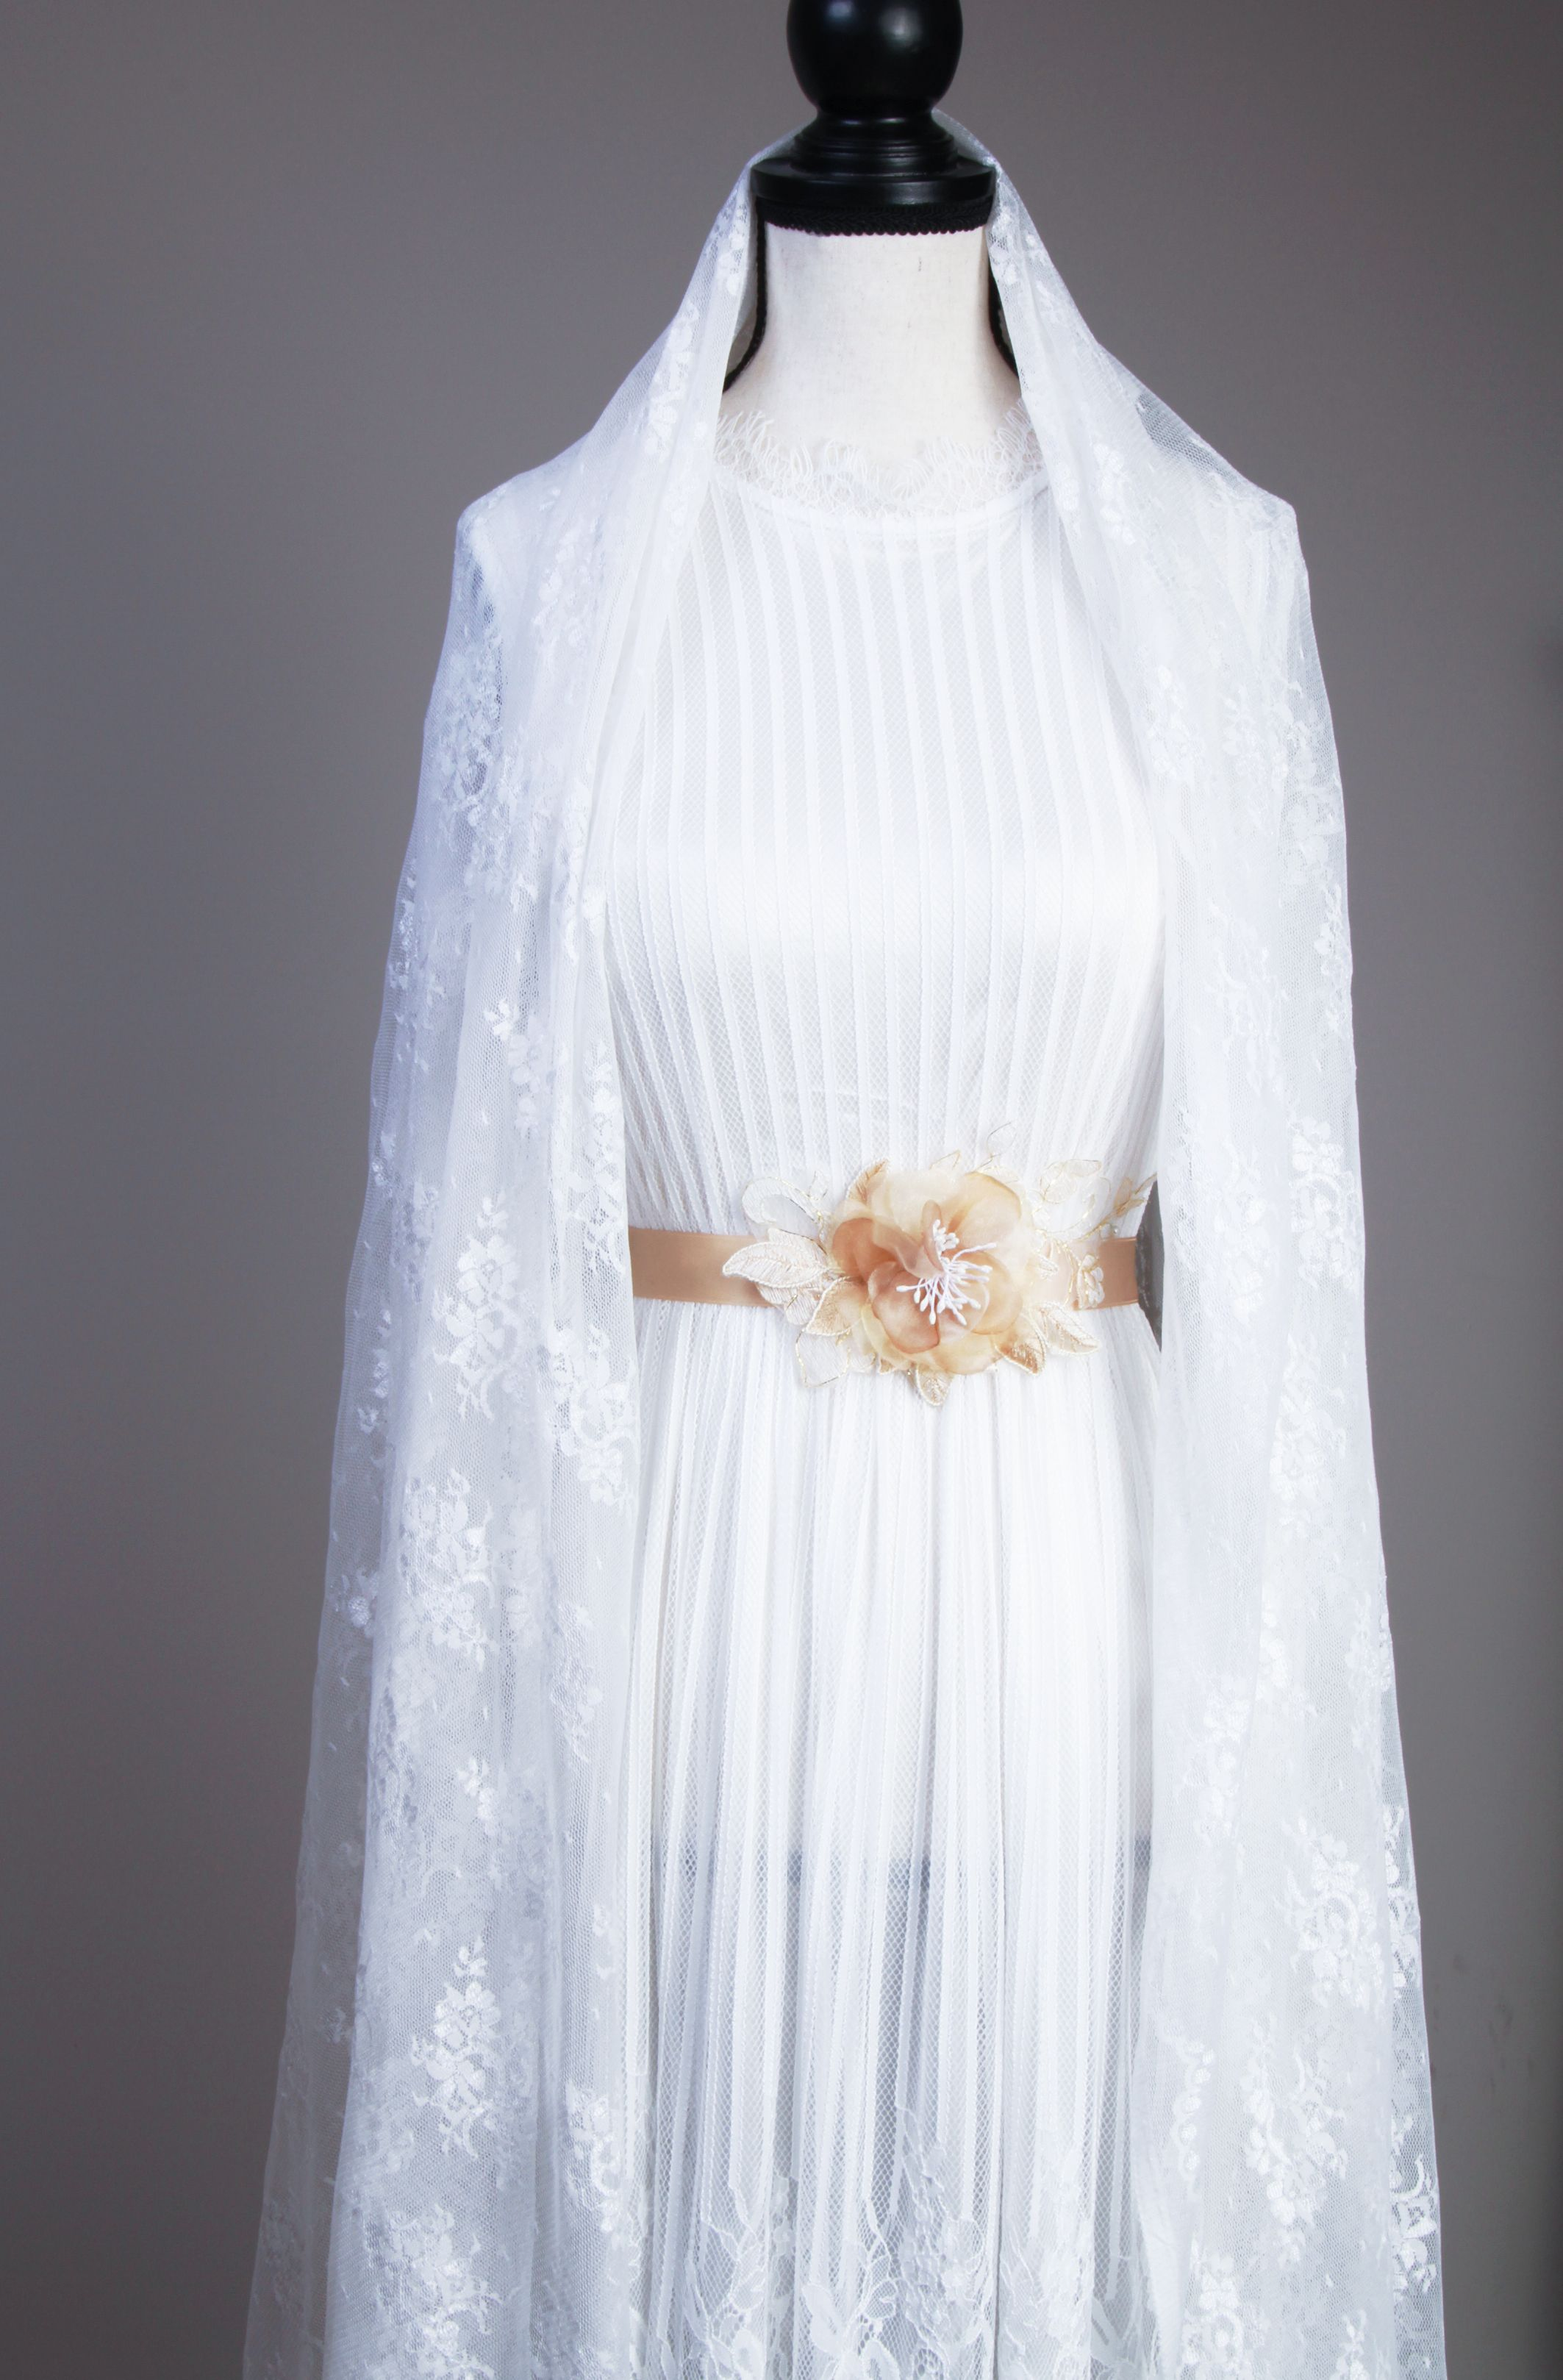 Bridal Sash Belt Wedding Dress Sashes Belts Champagne